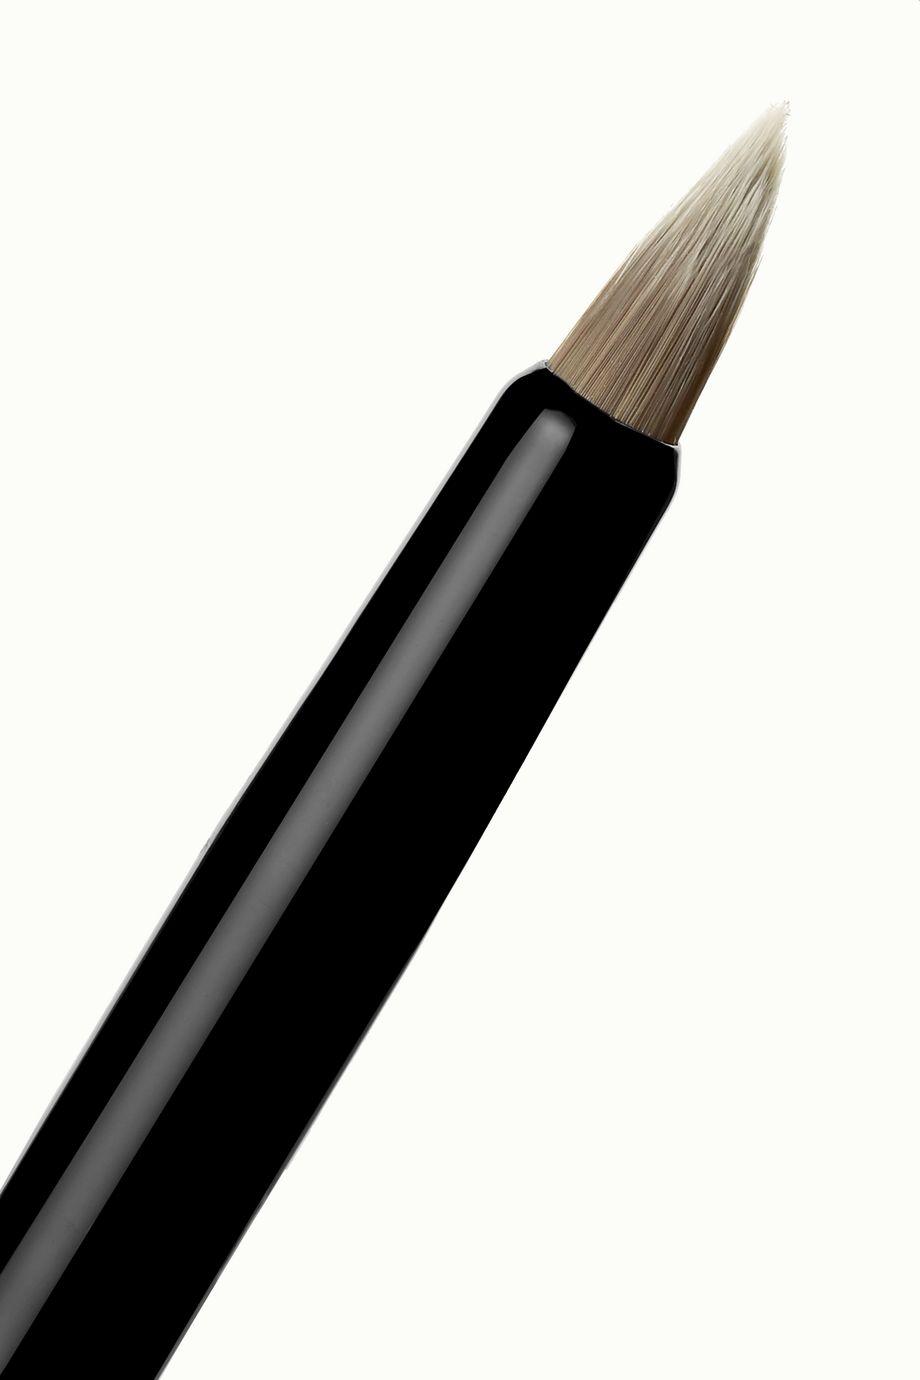 Rae Morris Jishaku 13 Deluxe Eyeliner Brush